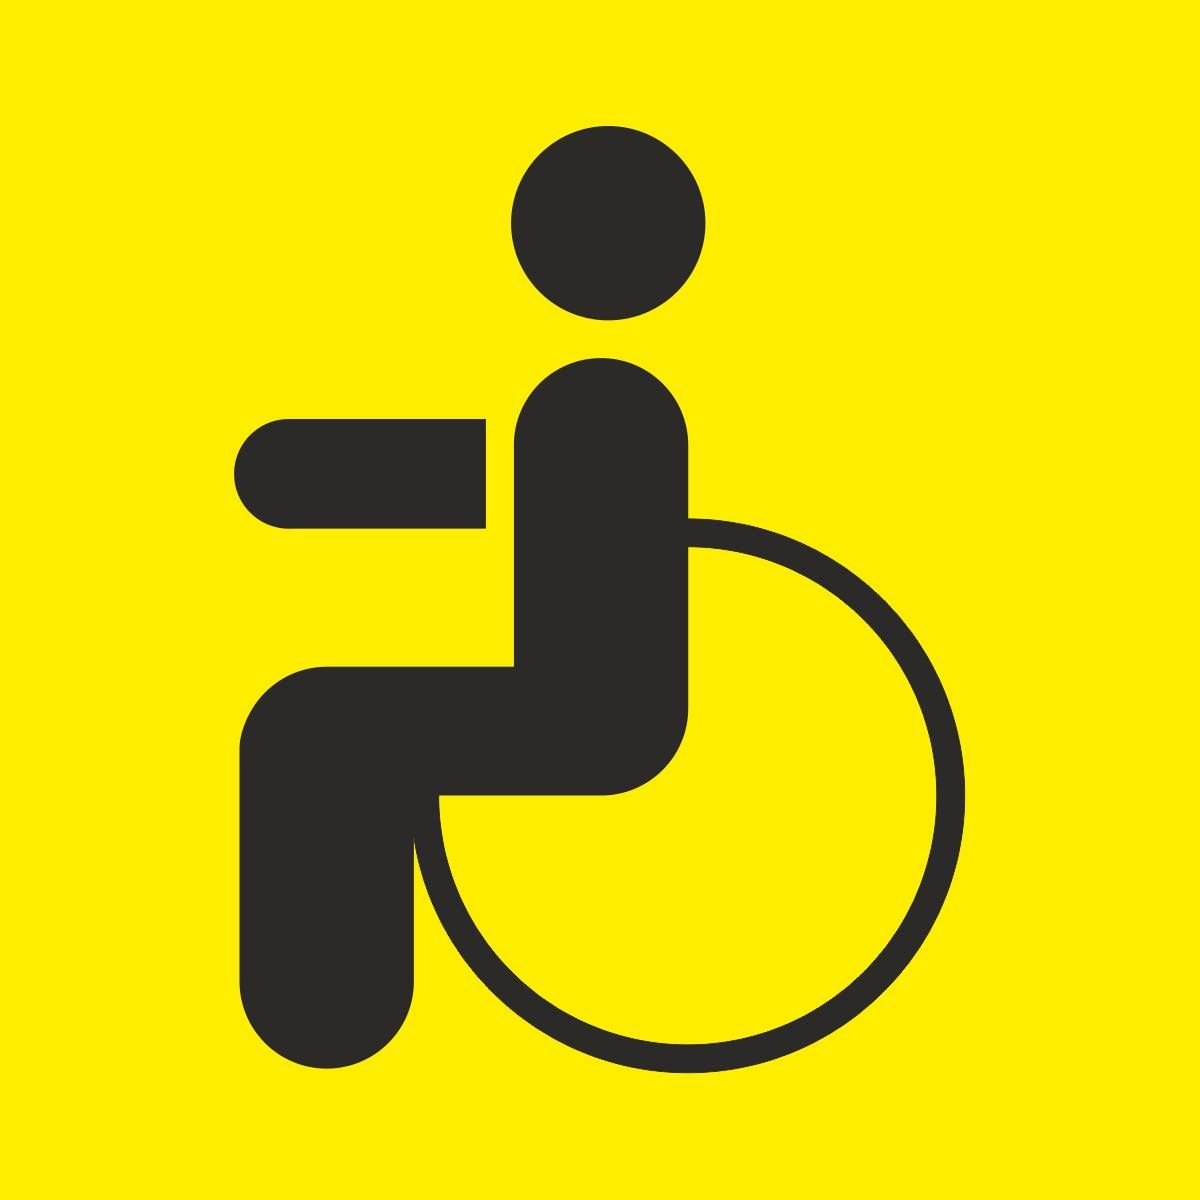 Наклейка автомобильная Фолиант Инвалид за рулем, цвет: желтый куплю журналы за рулем